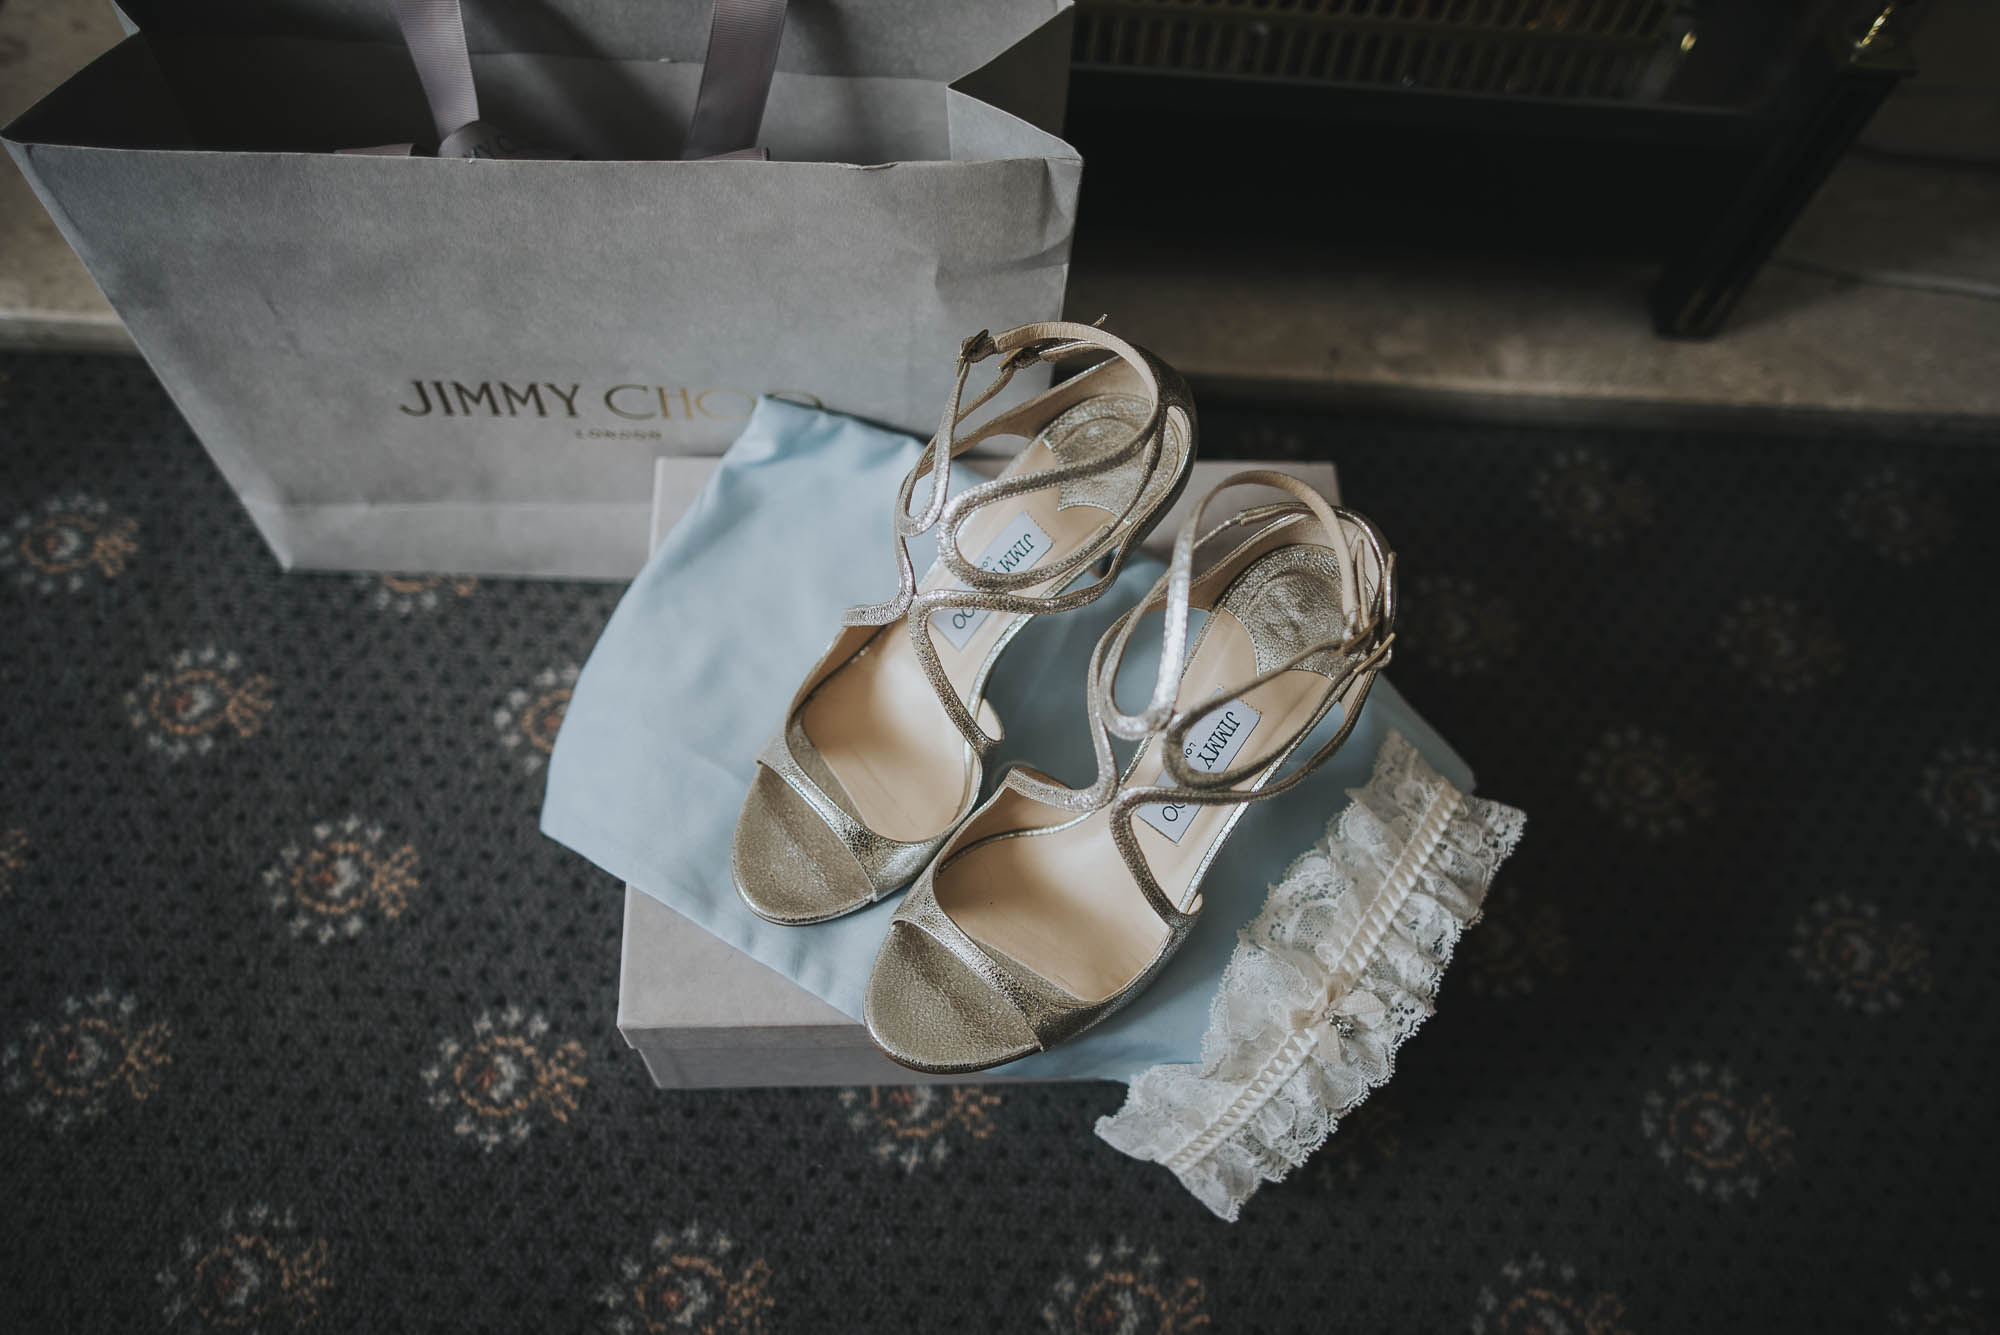 Brook Farm Wedding Photographer+Modern Hertfordshire Wedding Photographer+Creative Essex Wedding Photographer+Jimmy Choo shoes